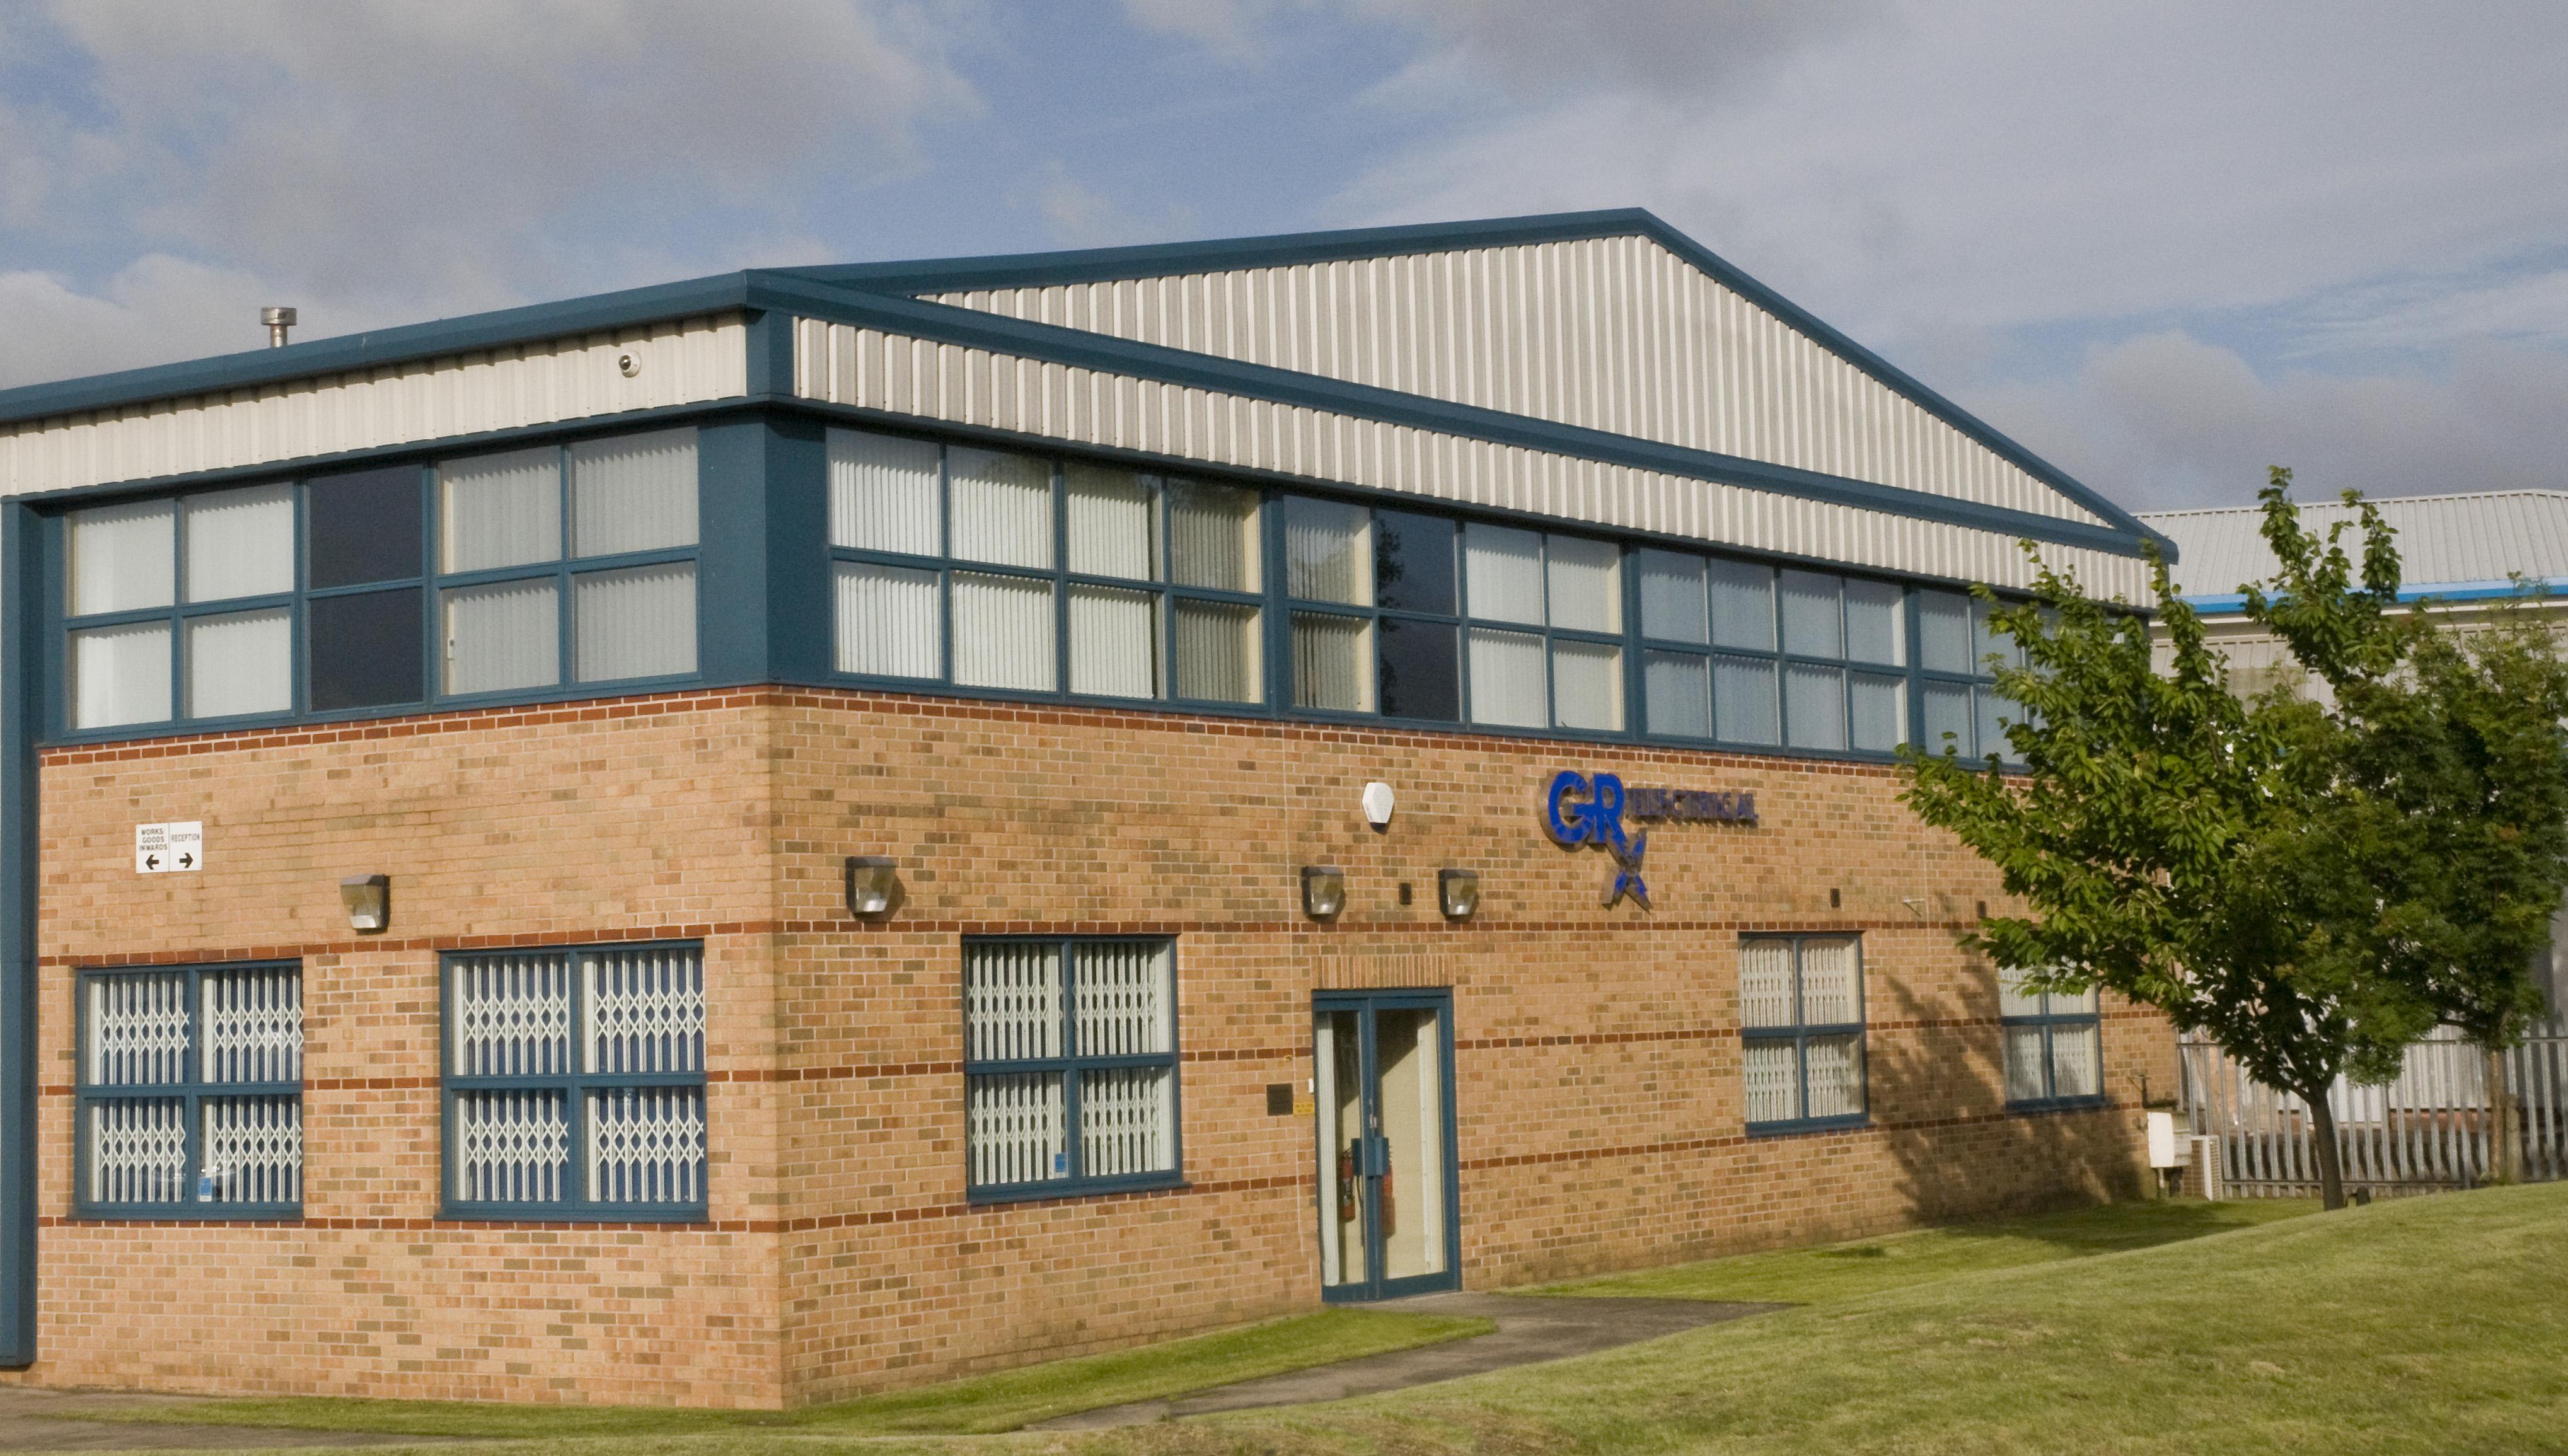 GR Electrical Services Ltd